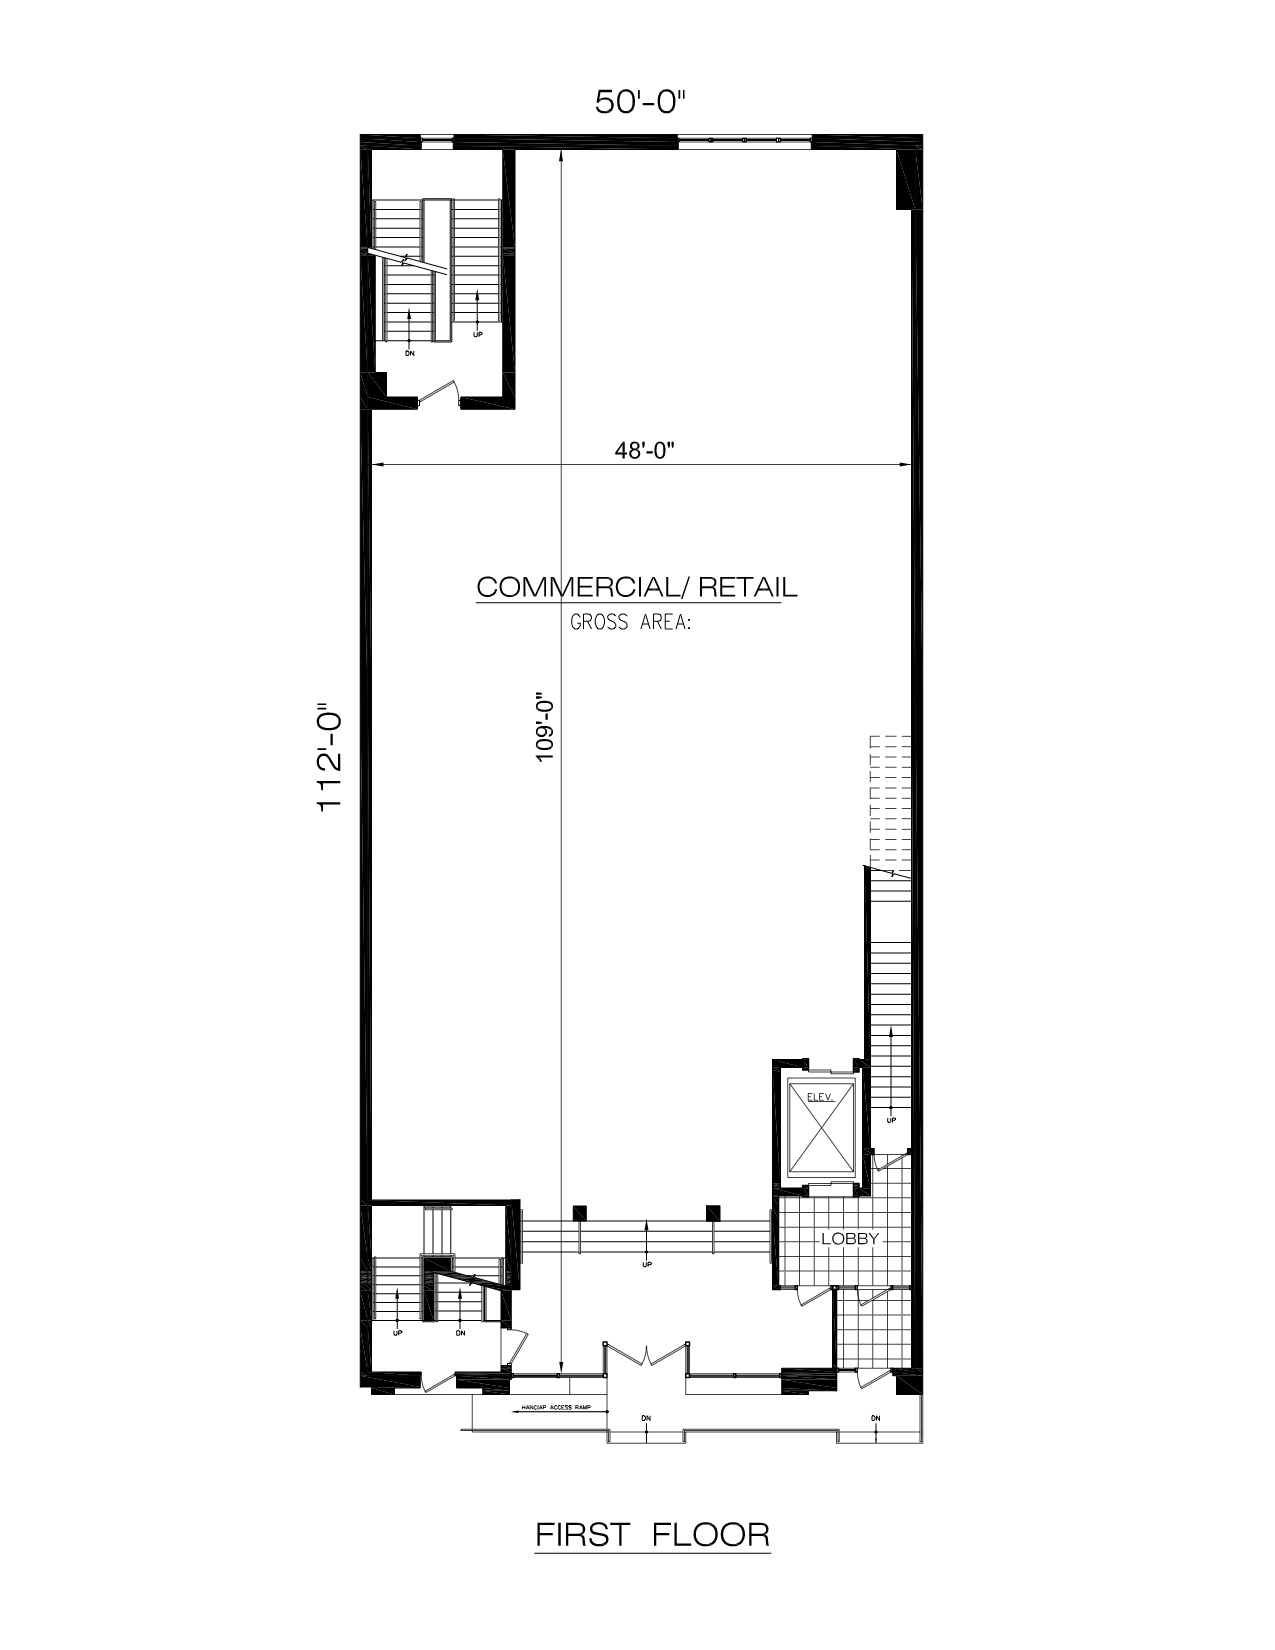 Court street entire building for lease oak tree llc for 125 court street floor plans